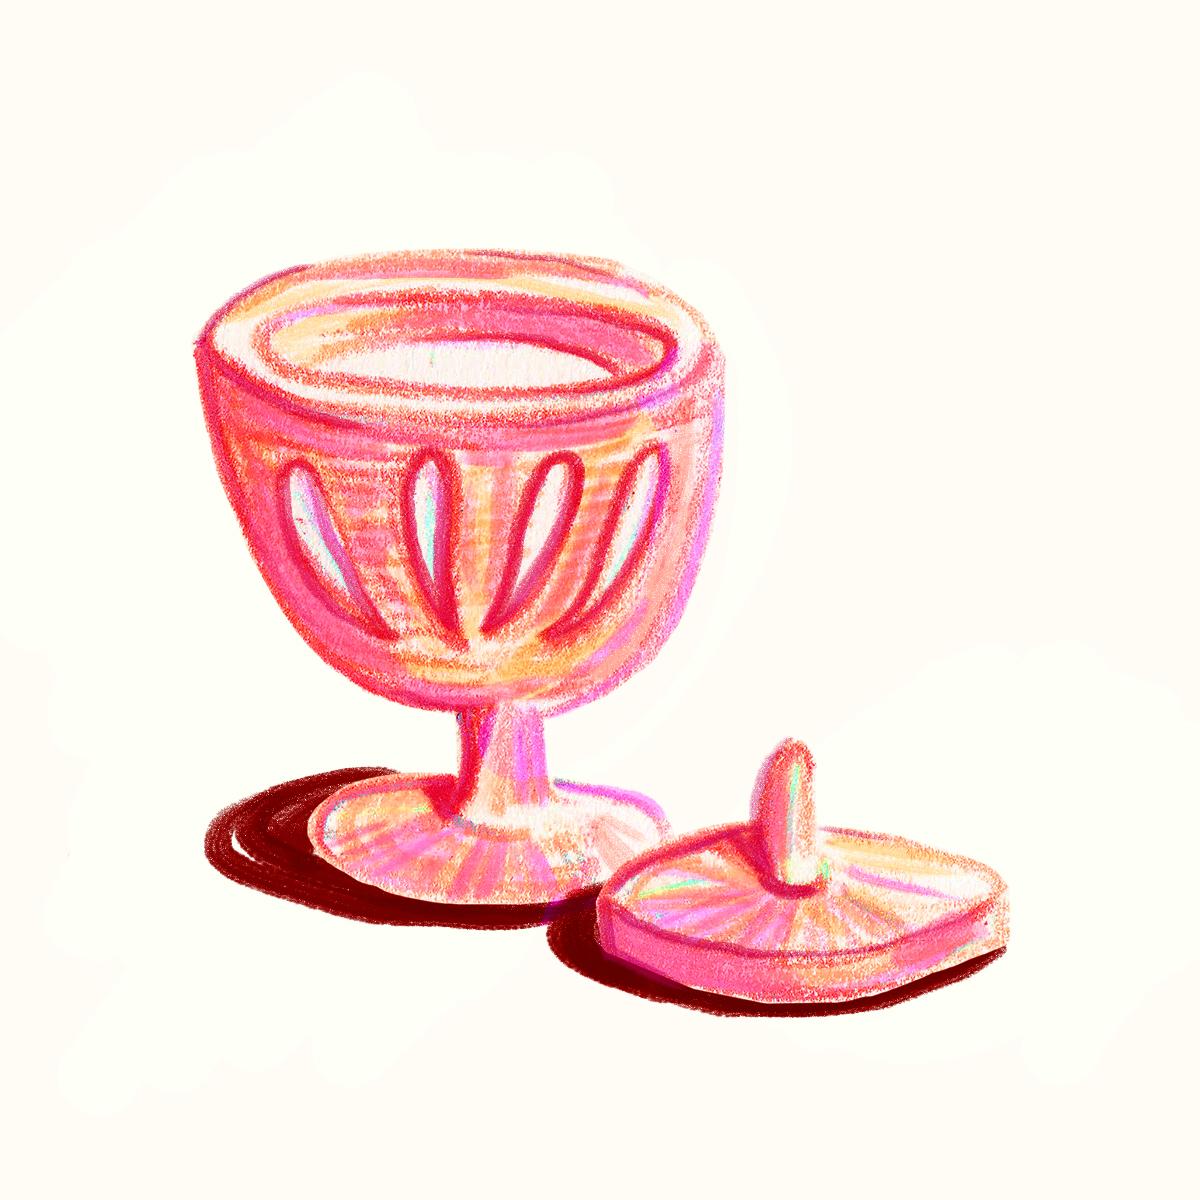 002-Sugar-2.jpg